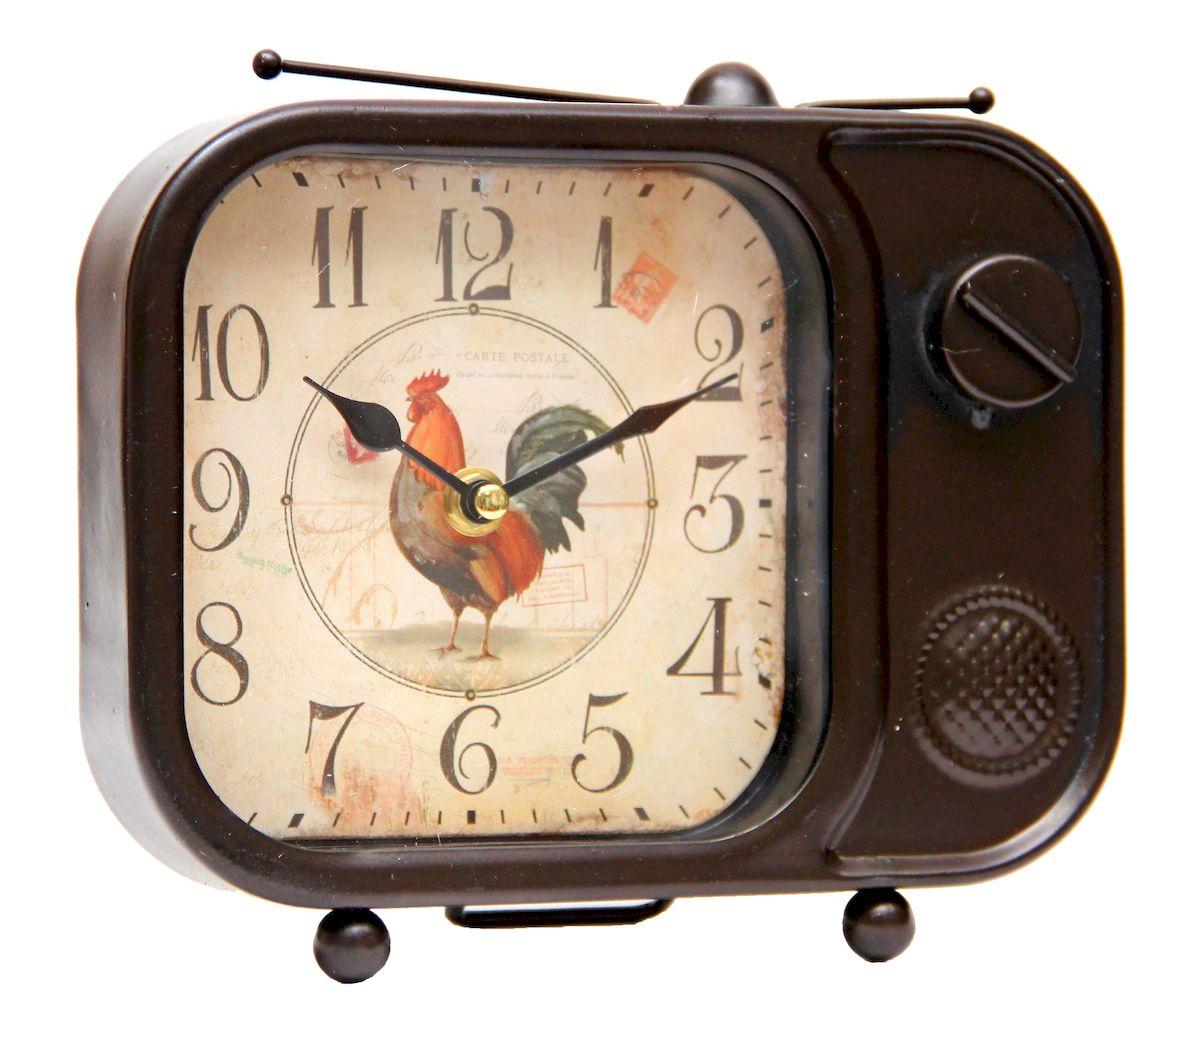 Часы настольные Magic Home Телевизор, кварцевые, цвет: коричневый телевизор телефункен